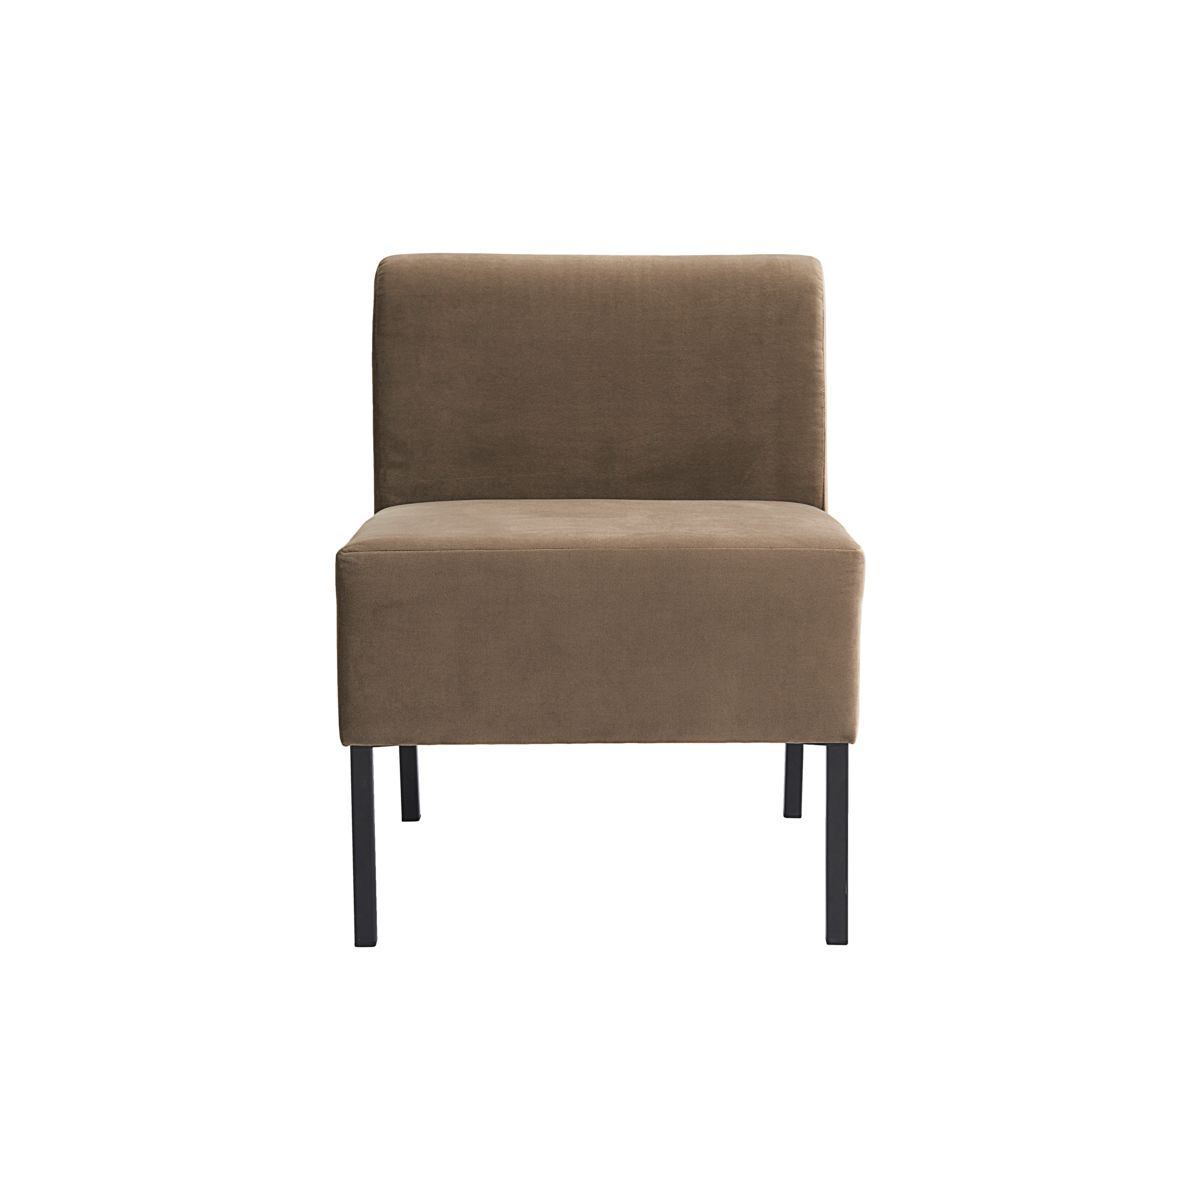 Hög soffa 1- sits modul Sand, House Doctor